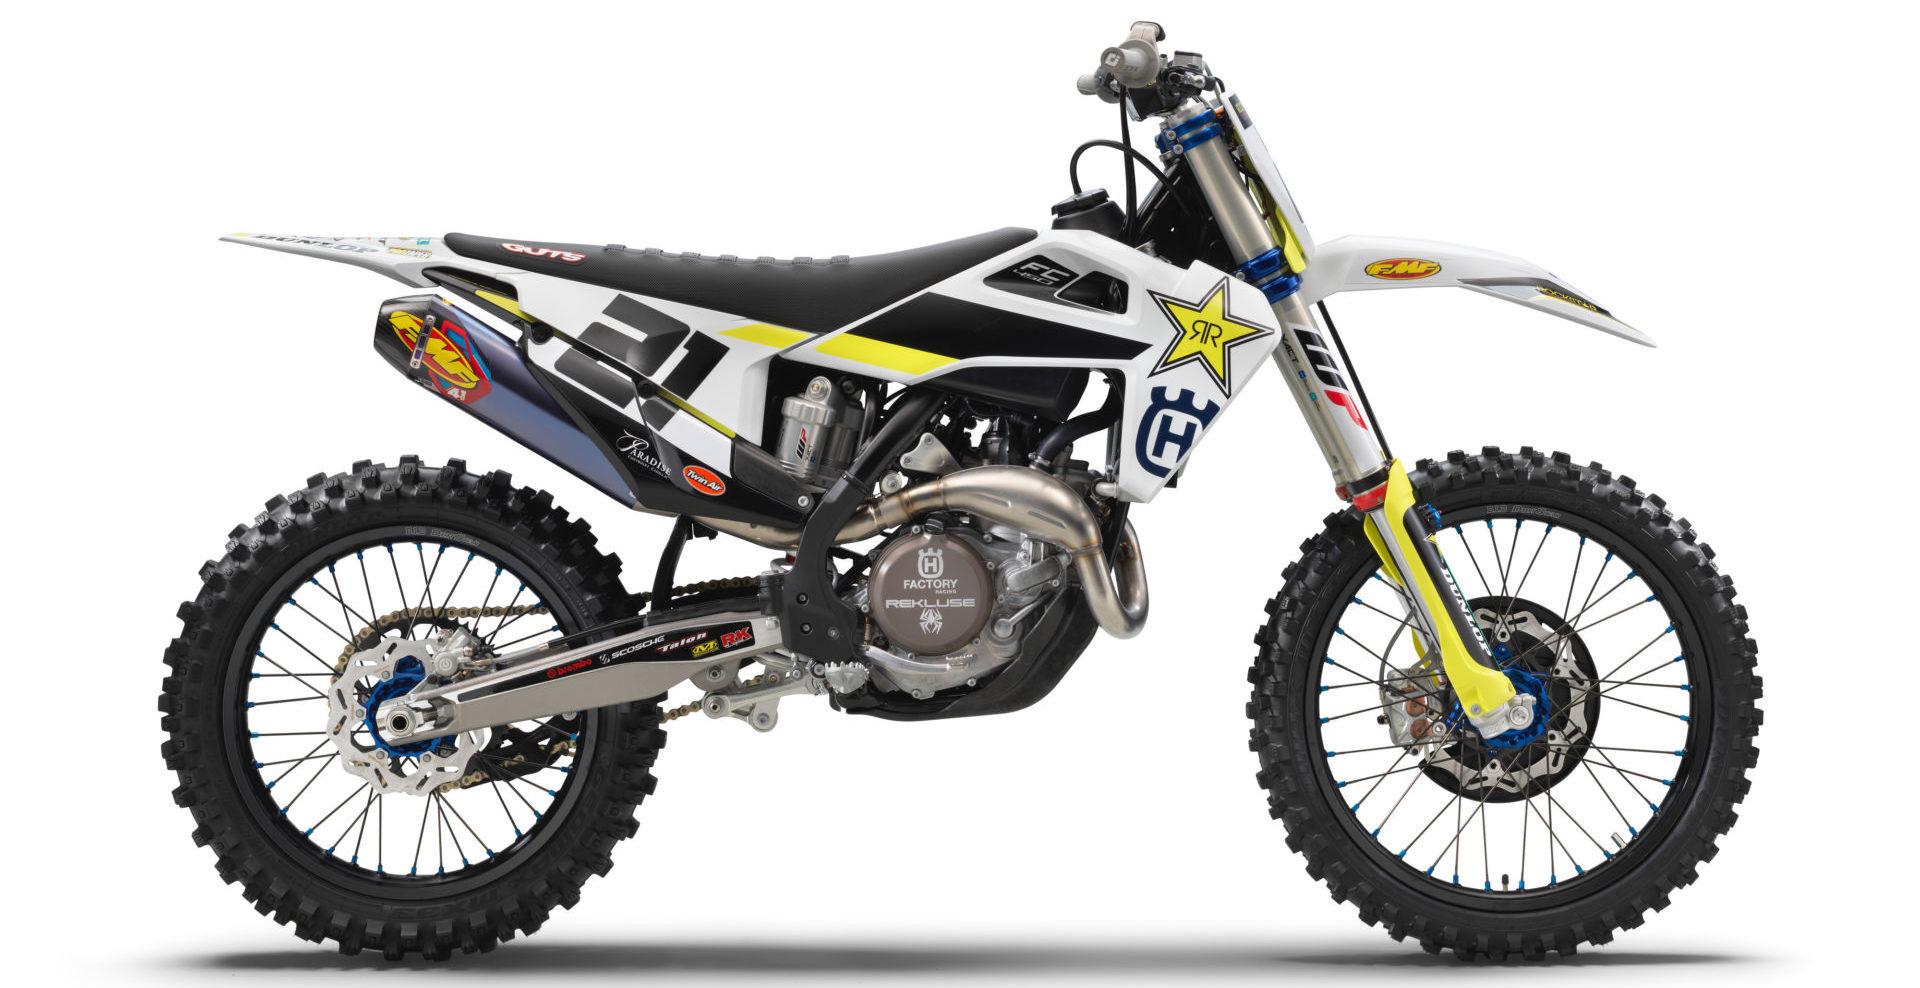 A 2020-model Husqvarna FC 450 Rockstar Edition. Photo courtesy of Husqvarna Motorcycles.